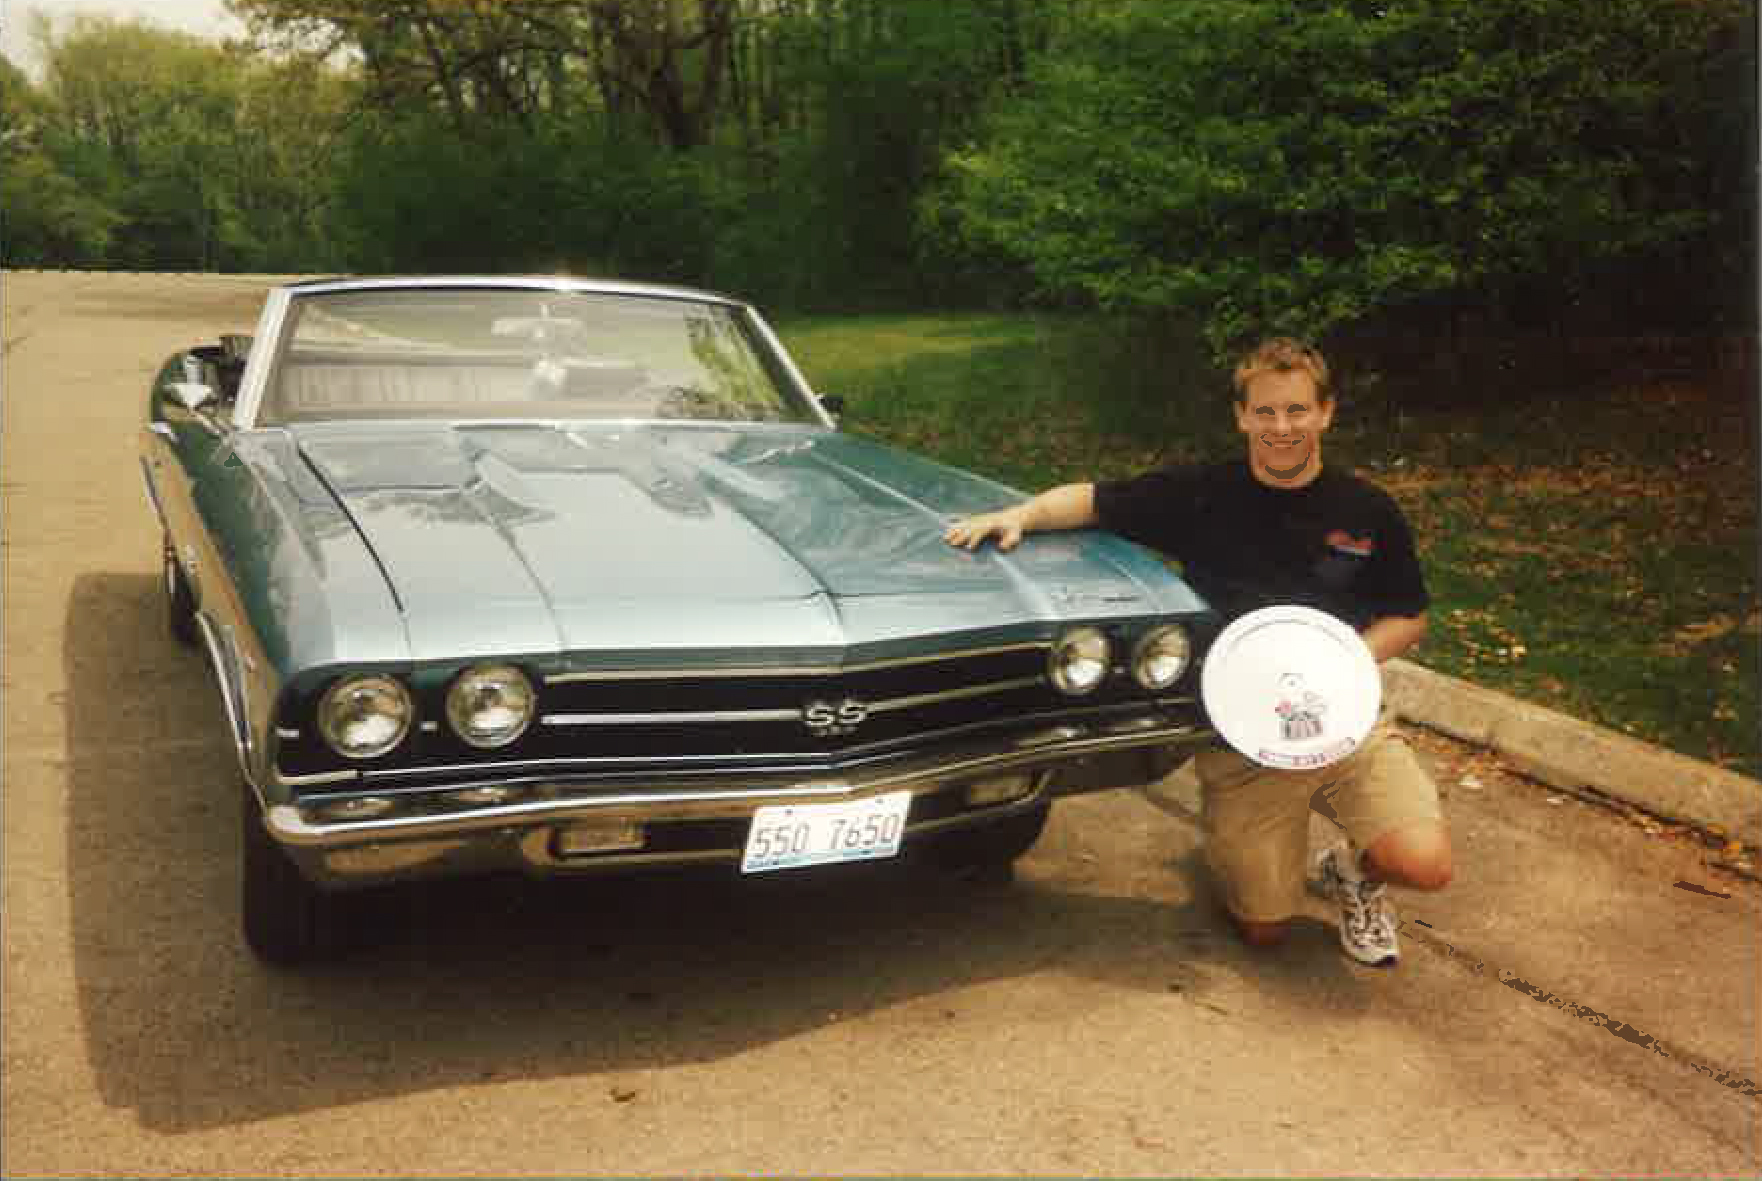 Brian Puchalski's & his 1969 Chevelle SS396 Convertible